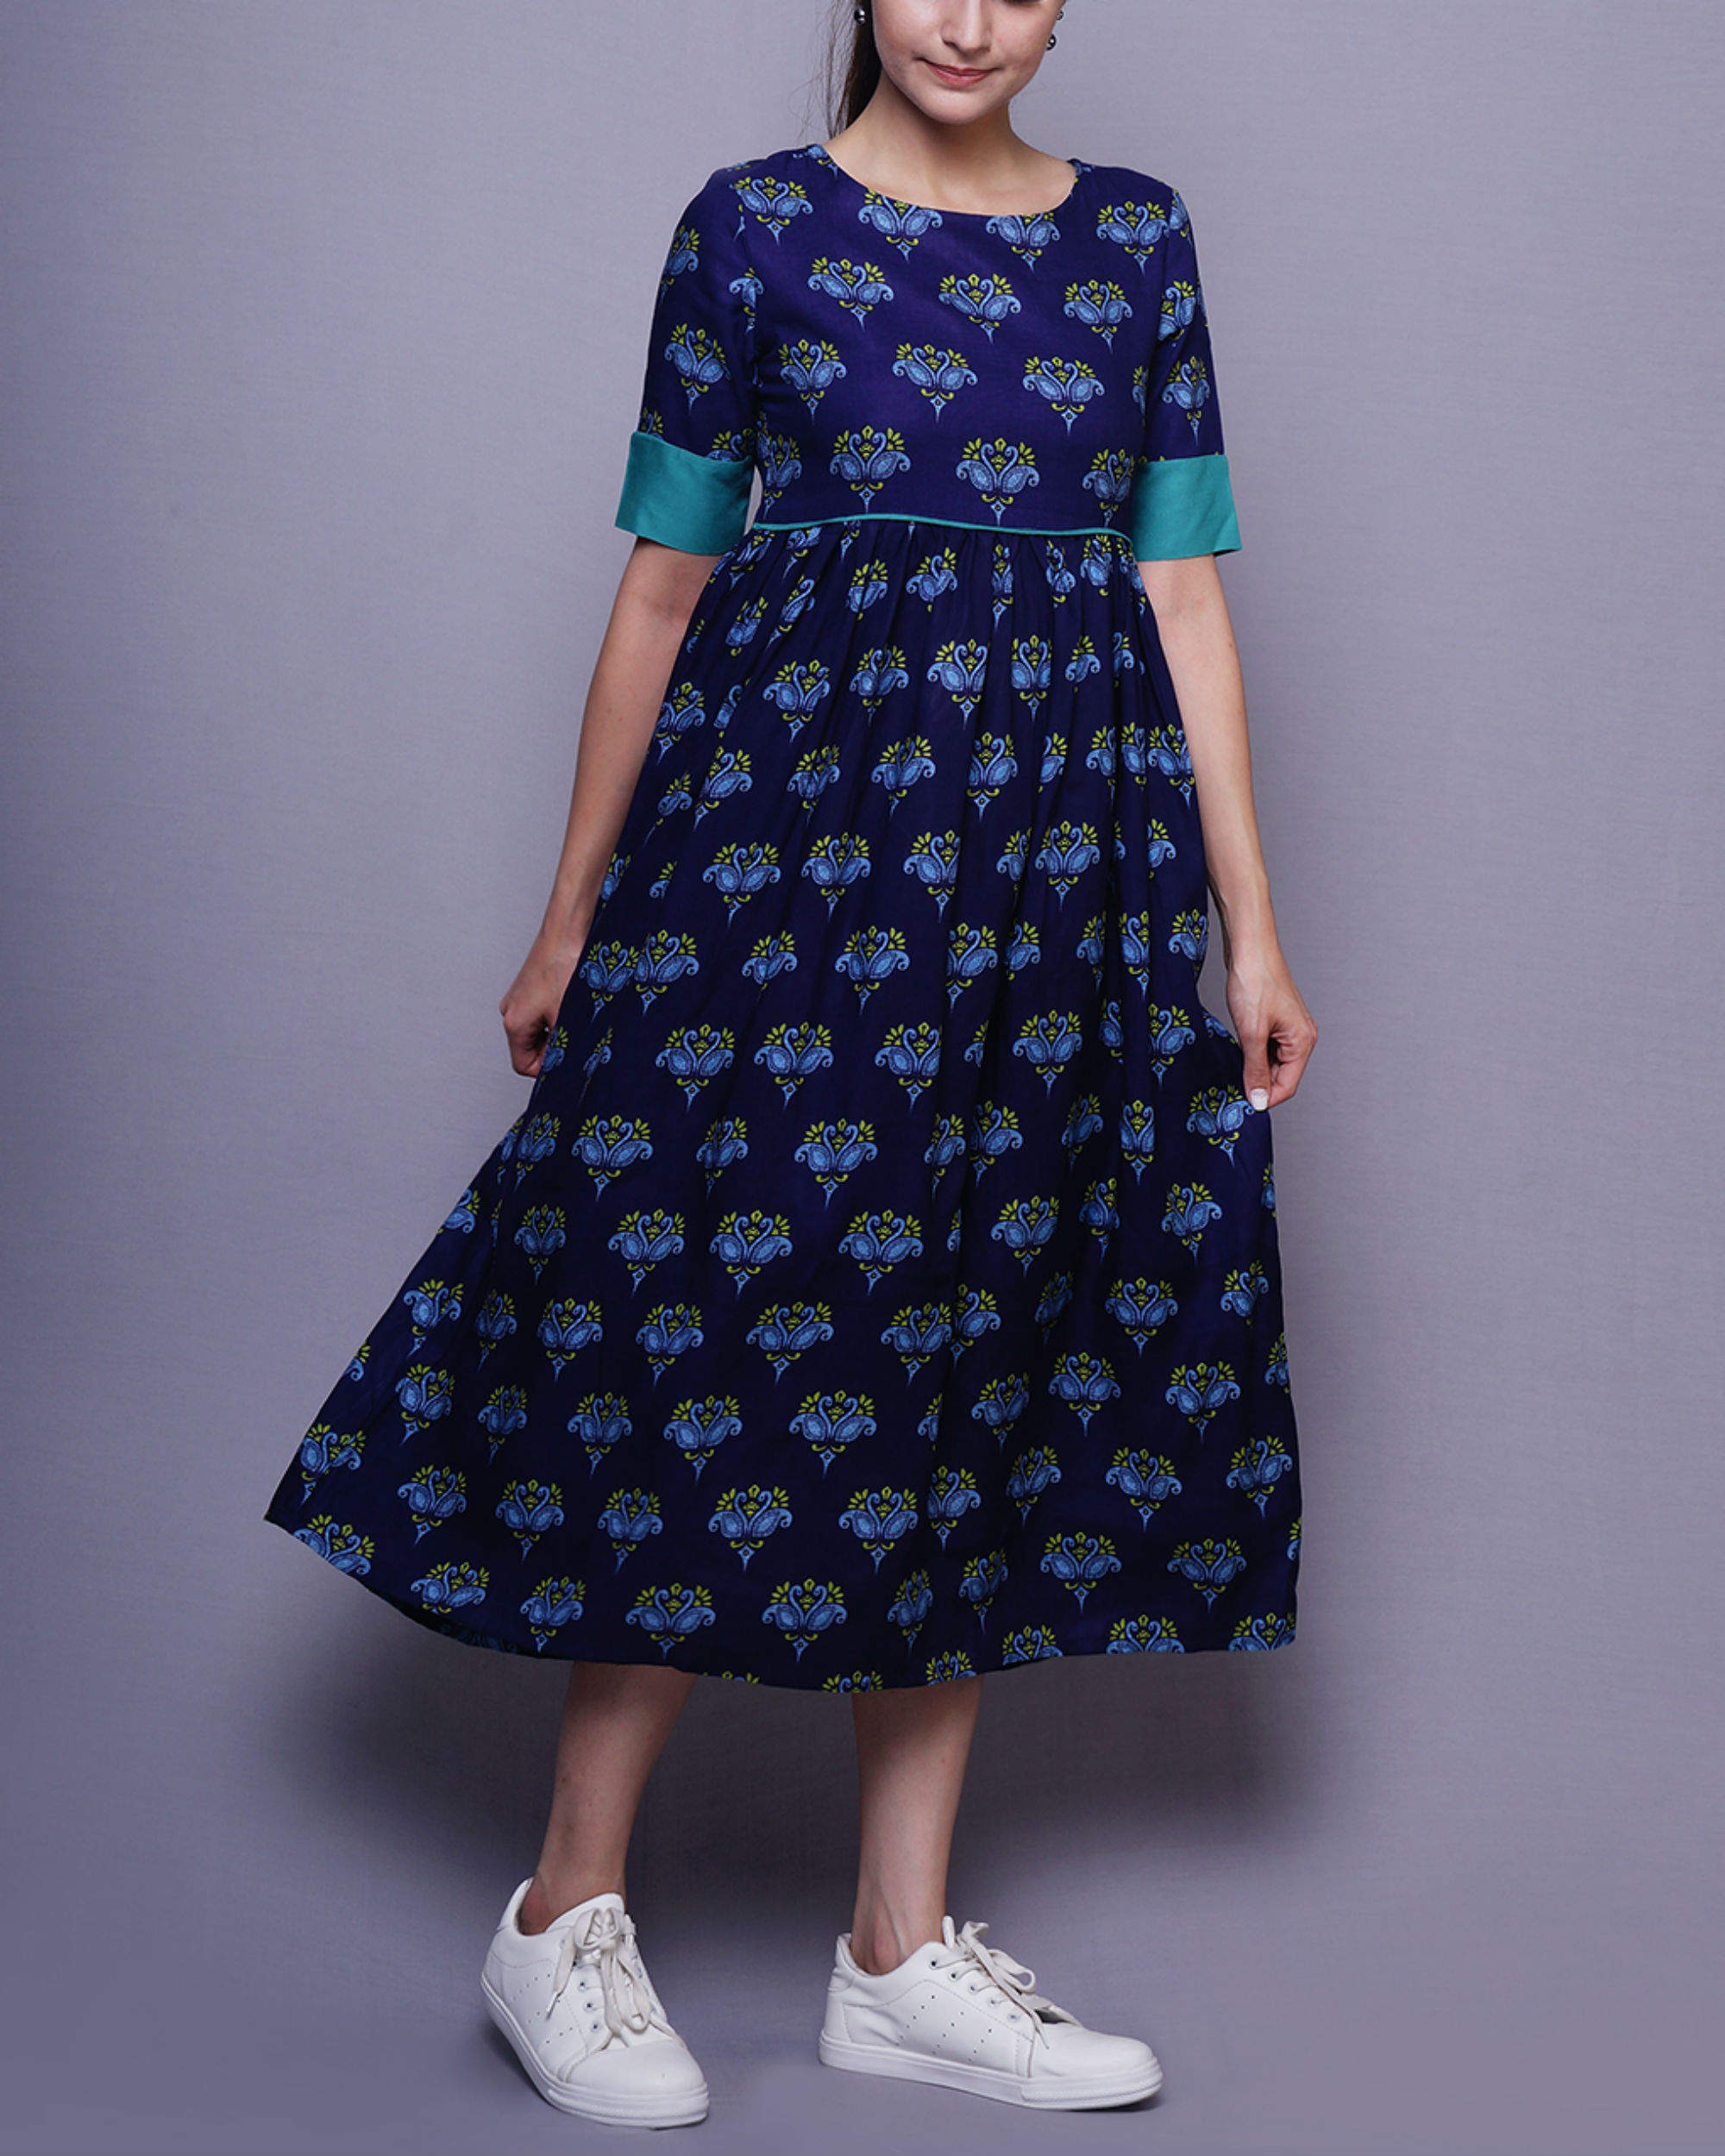 Blue swan dress